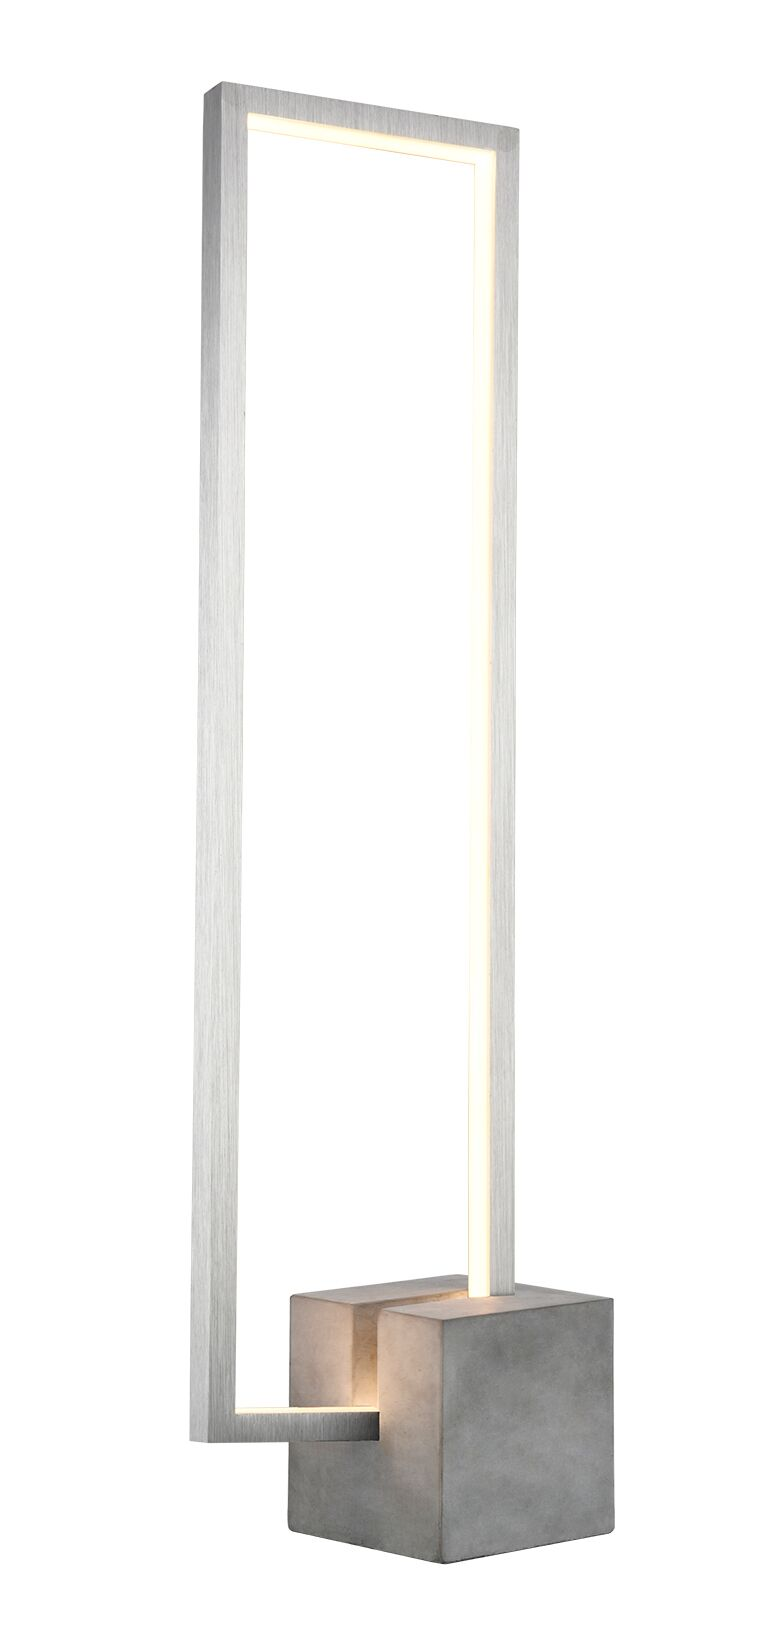 LAMPE DE TABLE DEL DAKUDO  CN 7836